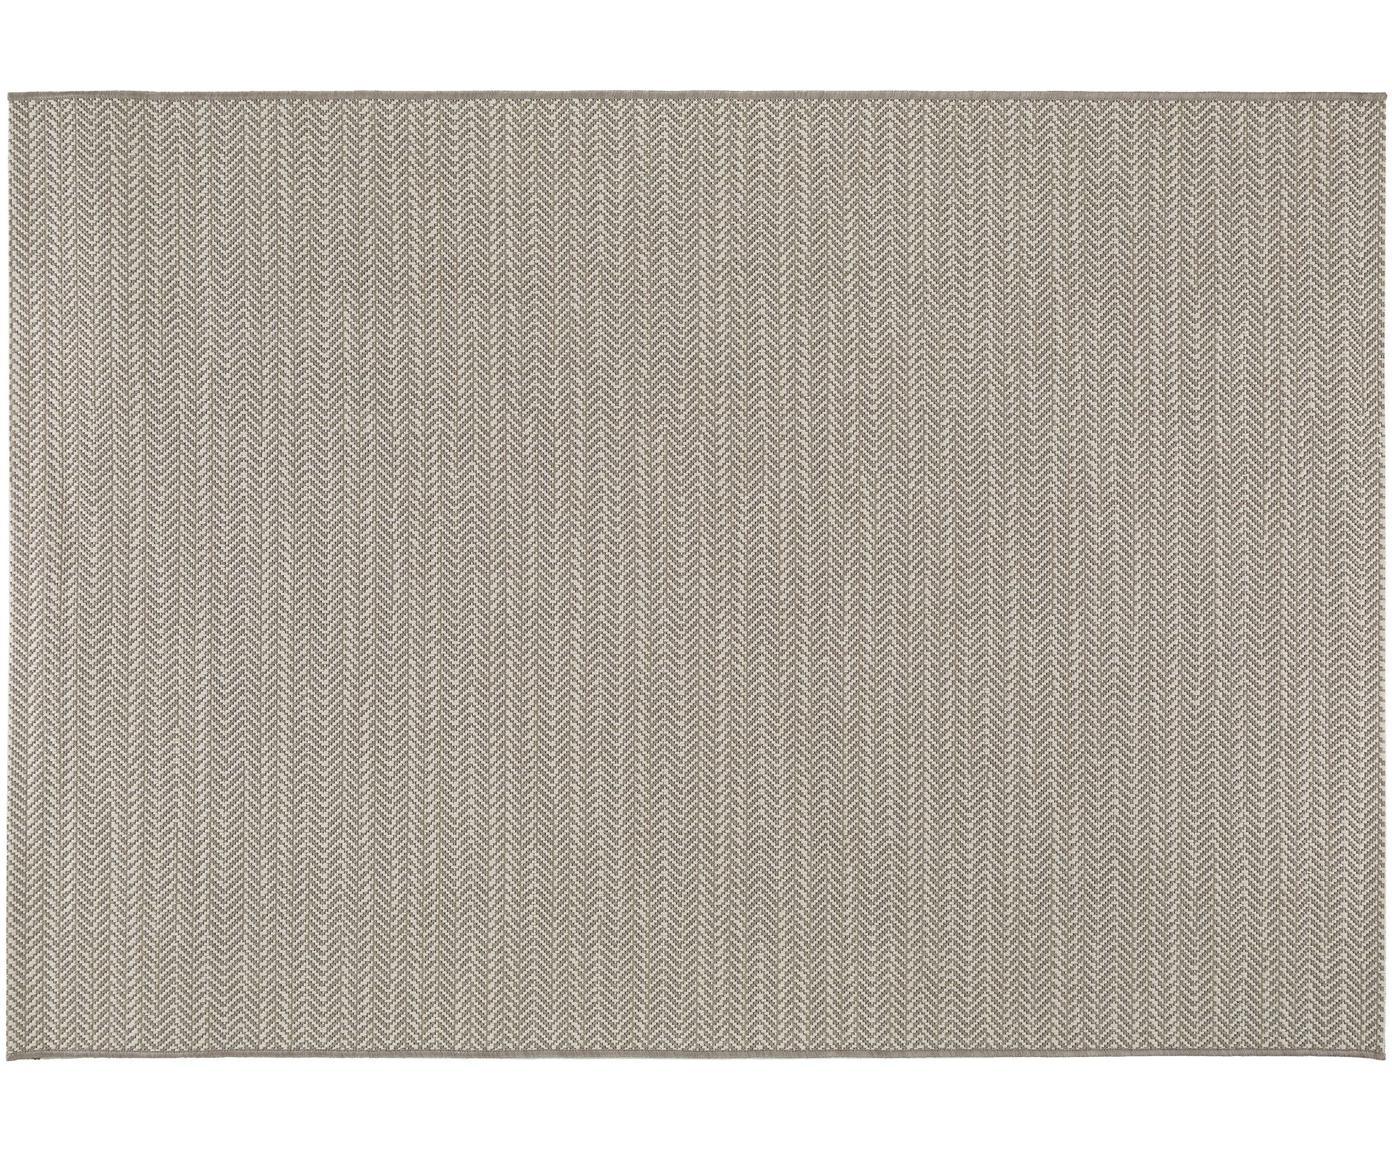 Alfombra de interior/exterior Metro Needle, Polipropileno, Beige, An 80 x L 150 cm (Tamaño XS)